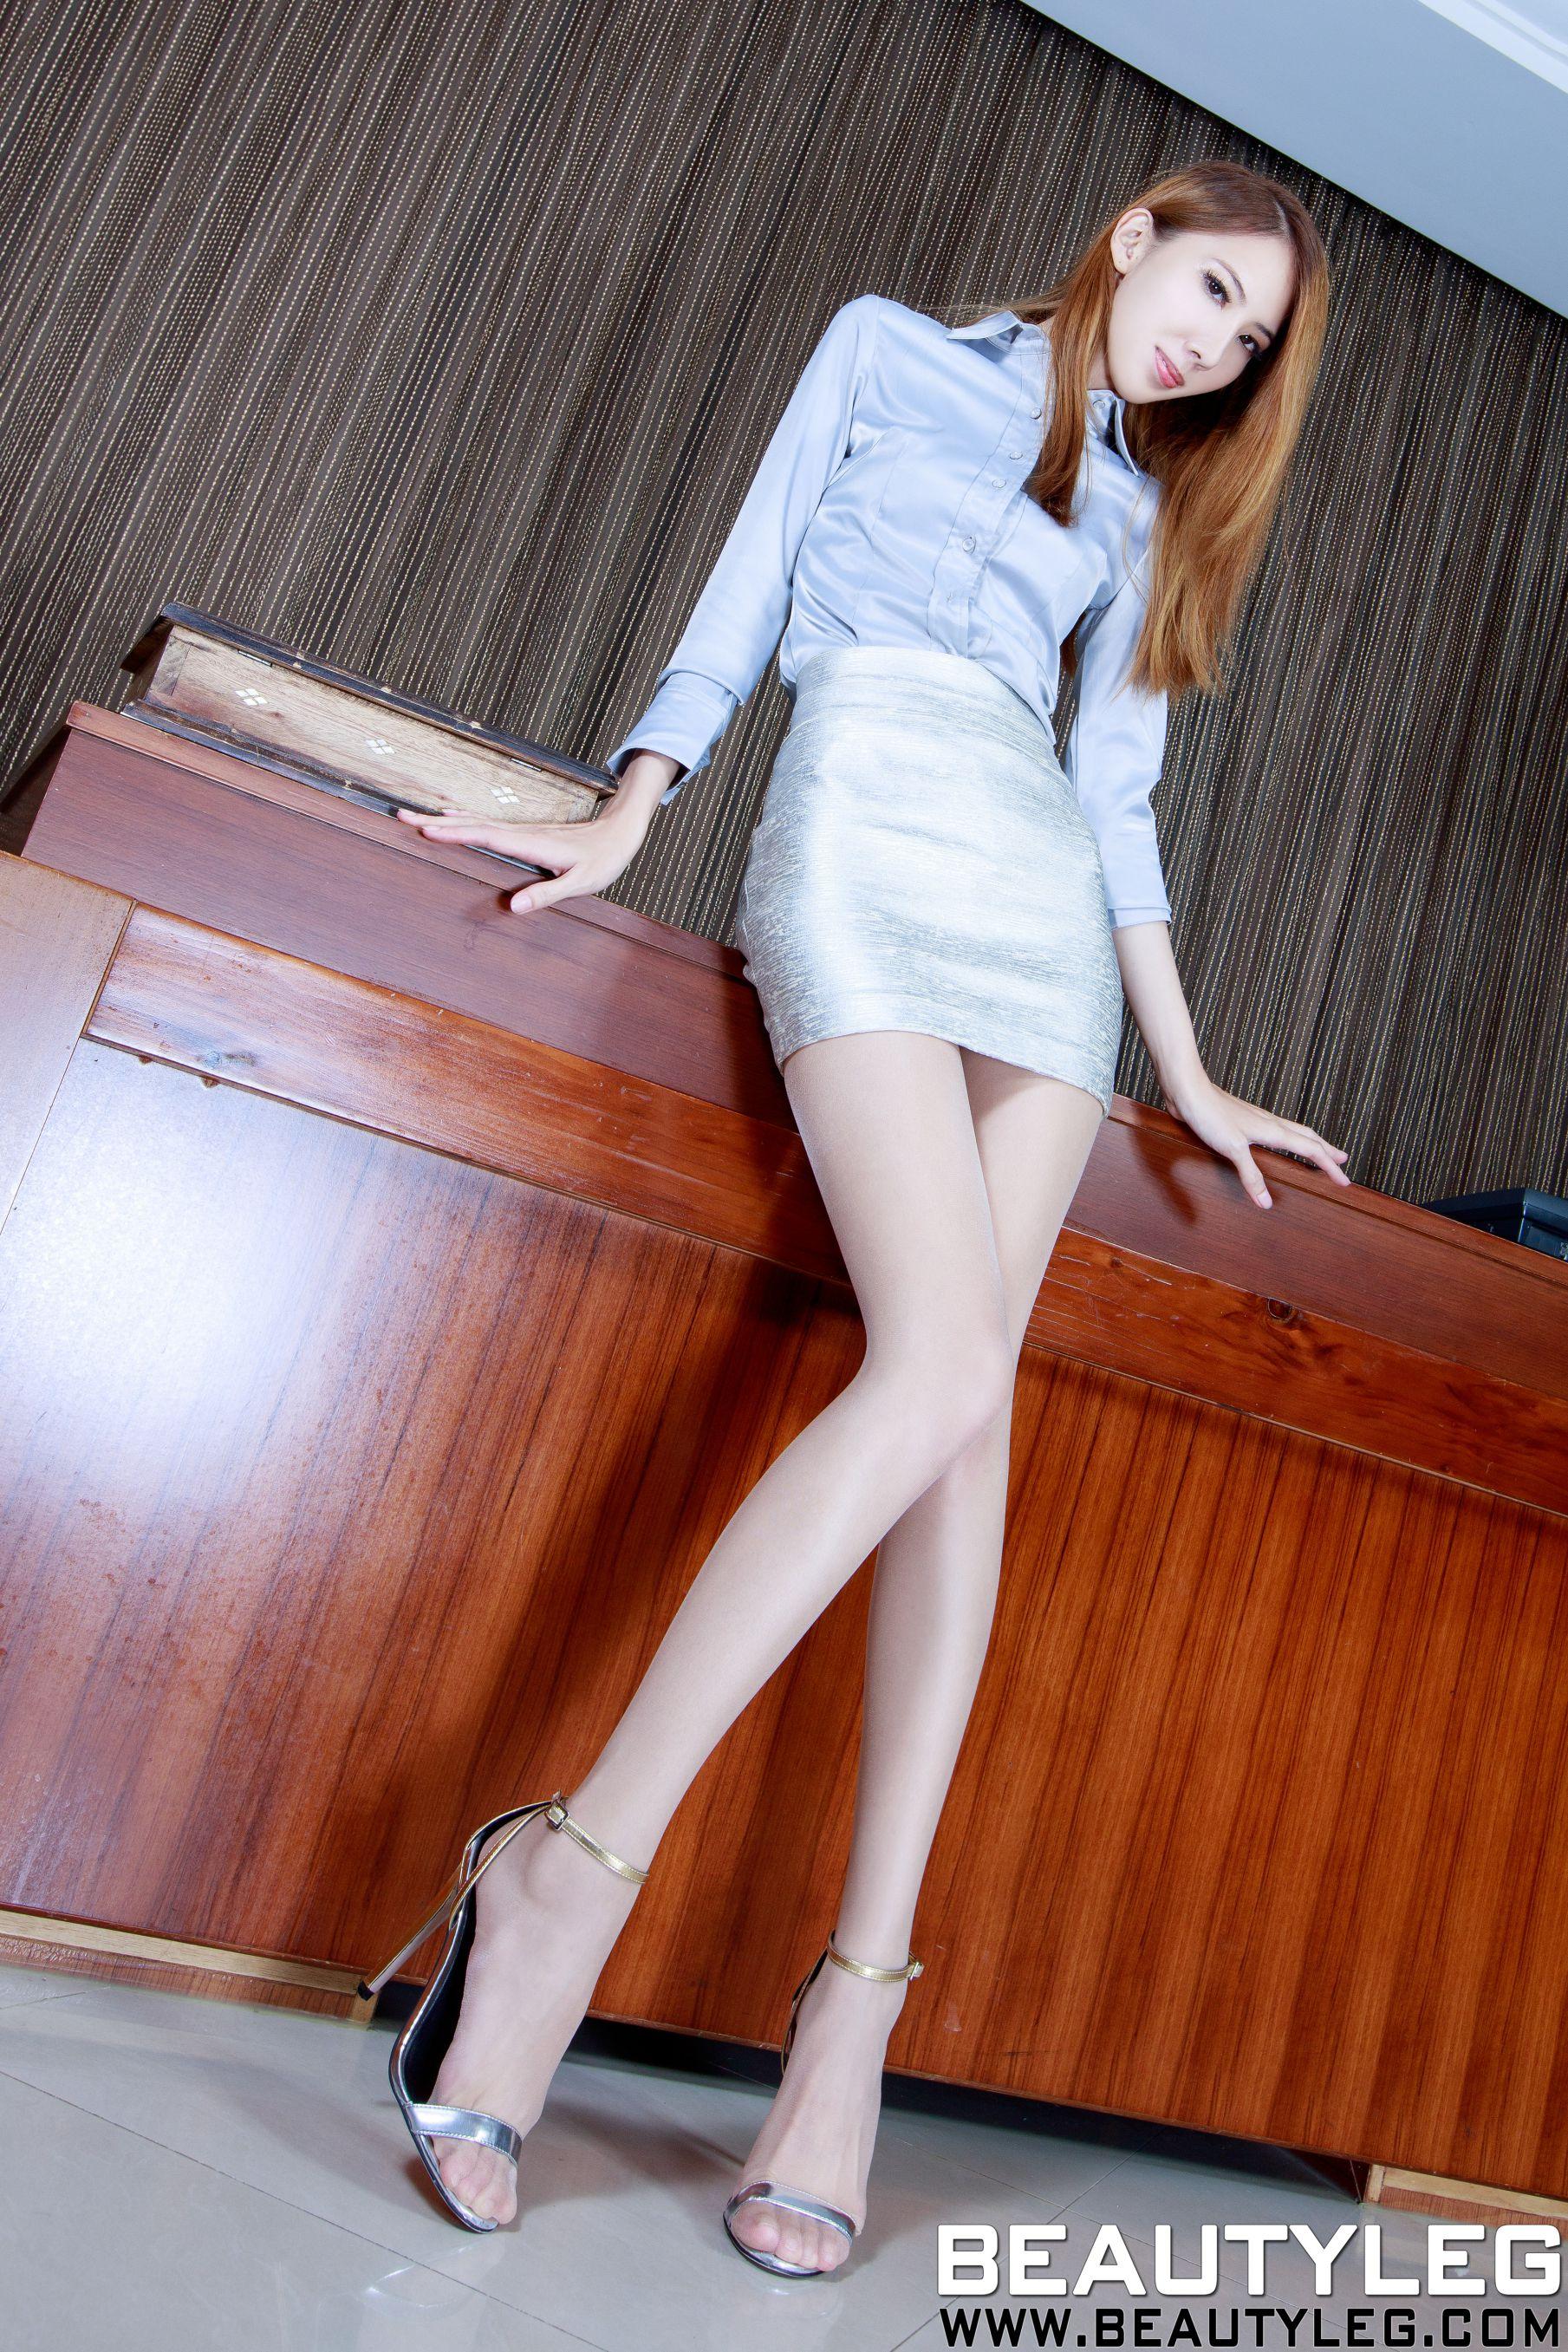 VOL.1679 [Beautyleg]美腿:童采萱(Beautyleg Yoyo,腿模Yoyo)高品质写真套图(44P)